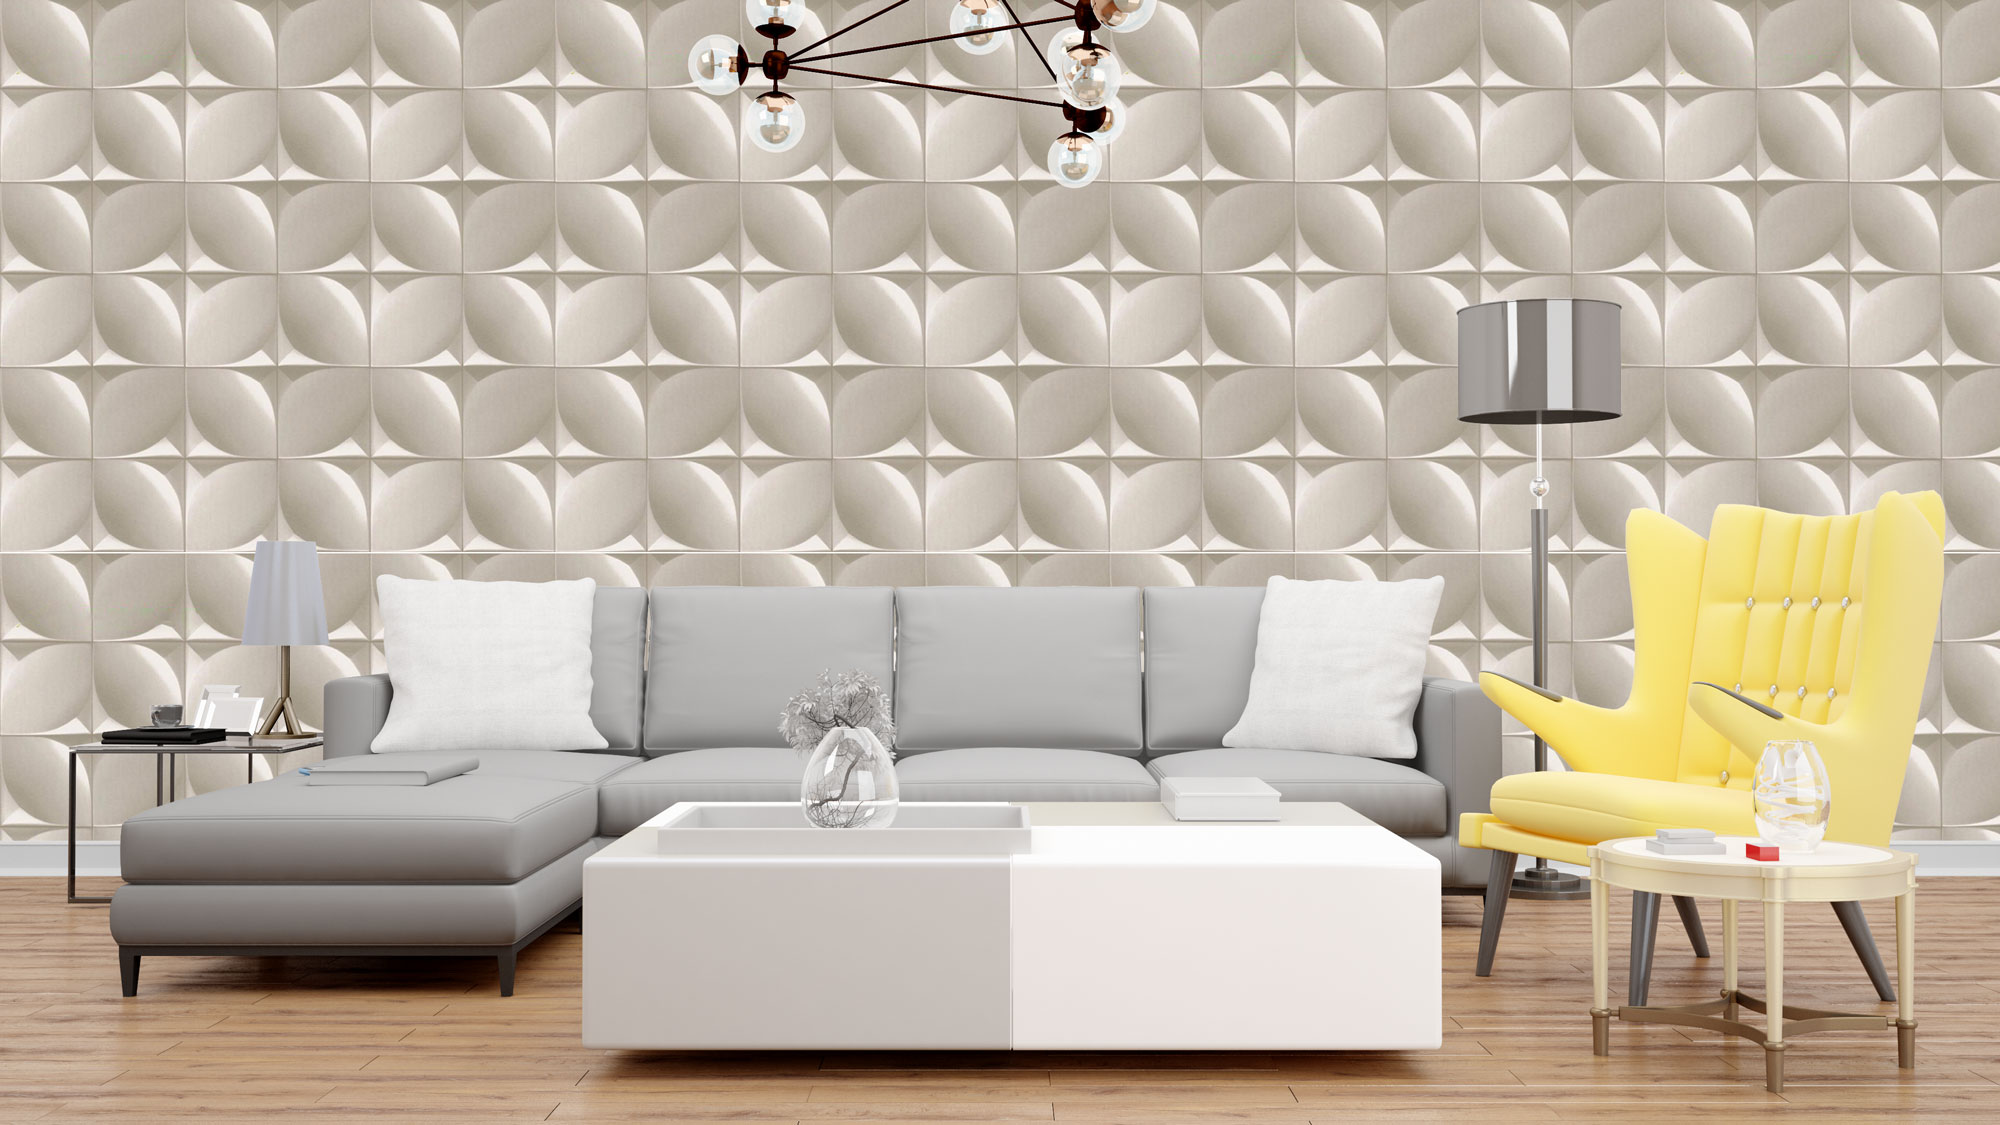 3d Wallpaper Designs In Nigeria - 2000x1125 - Download HD ...